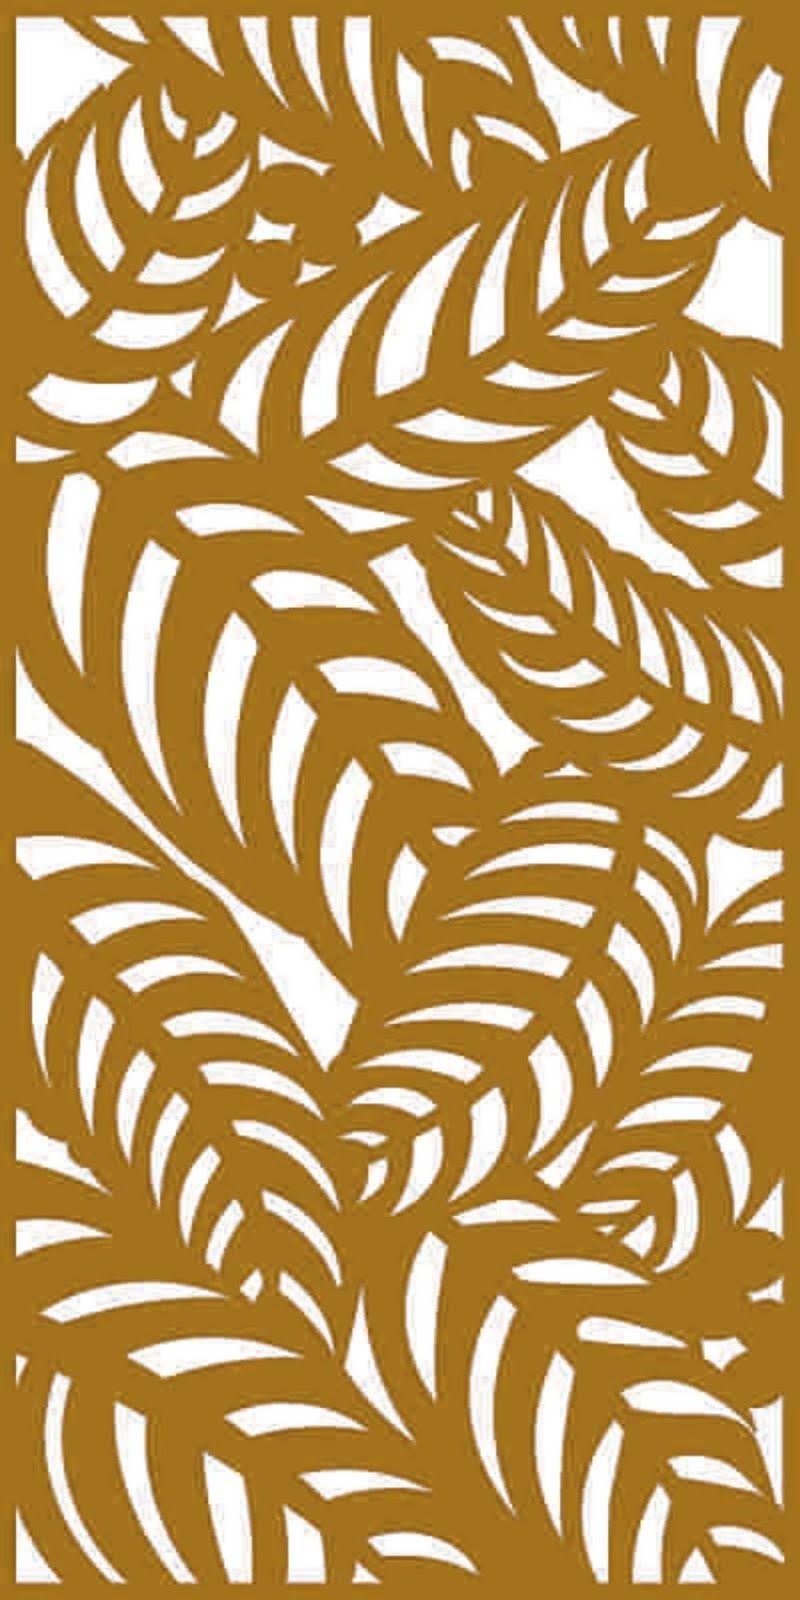 Katalog 2d Panel Design A Desain Pola Kreatif Desain